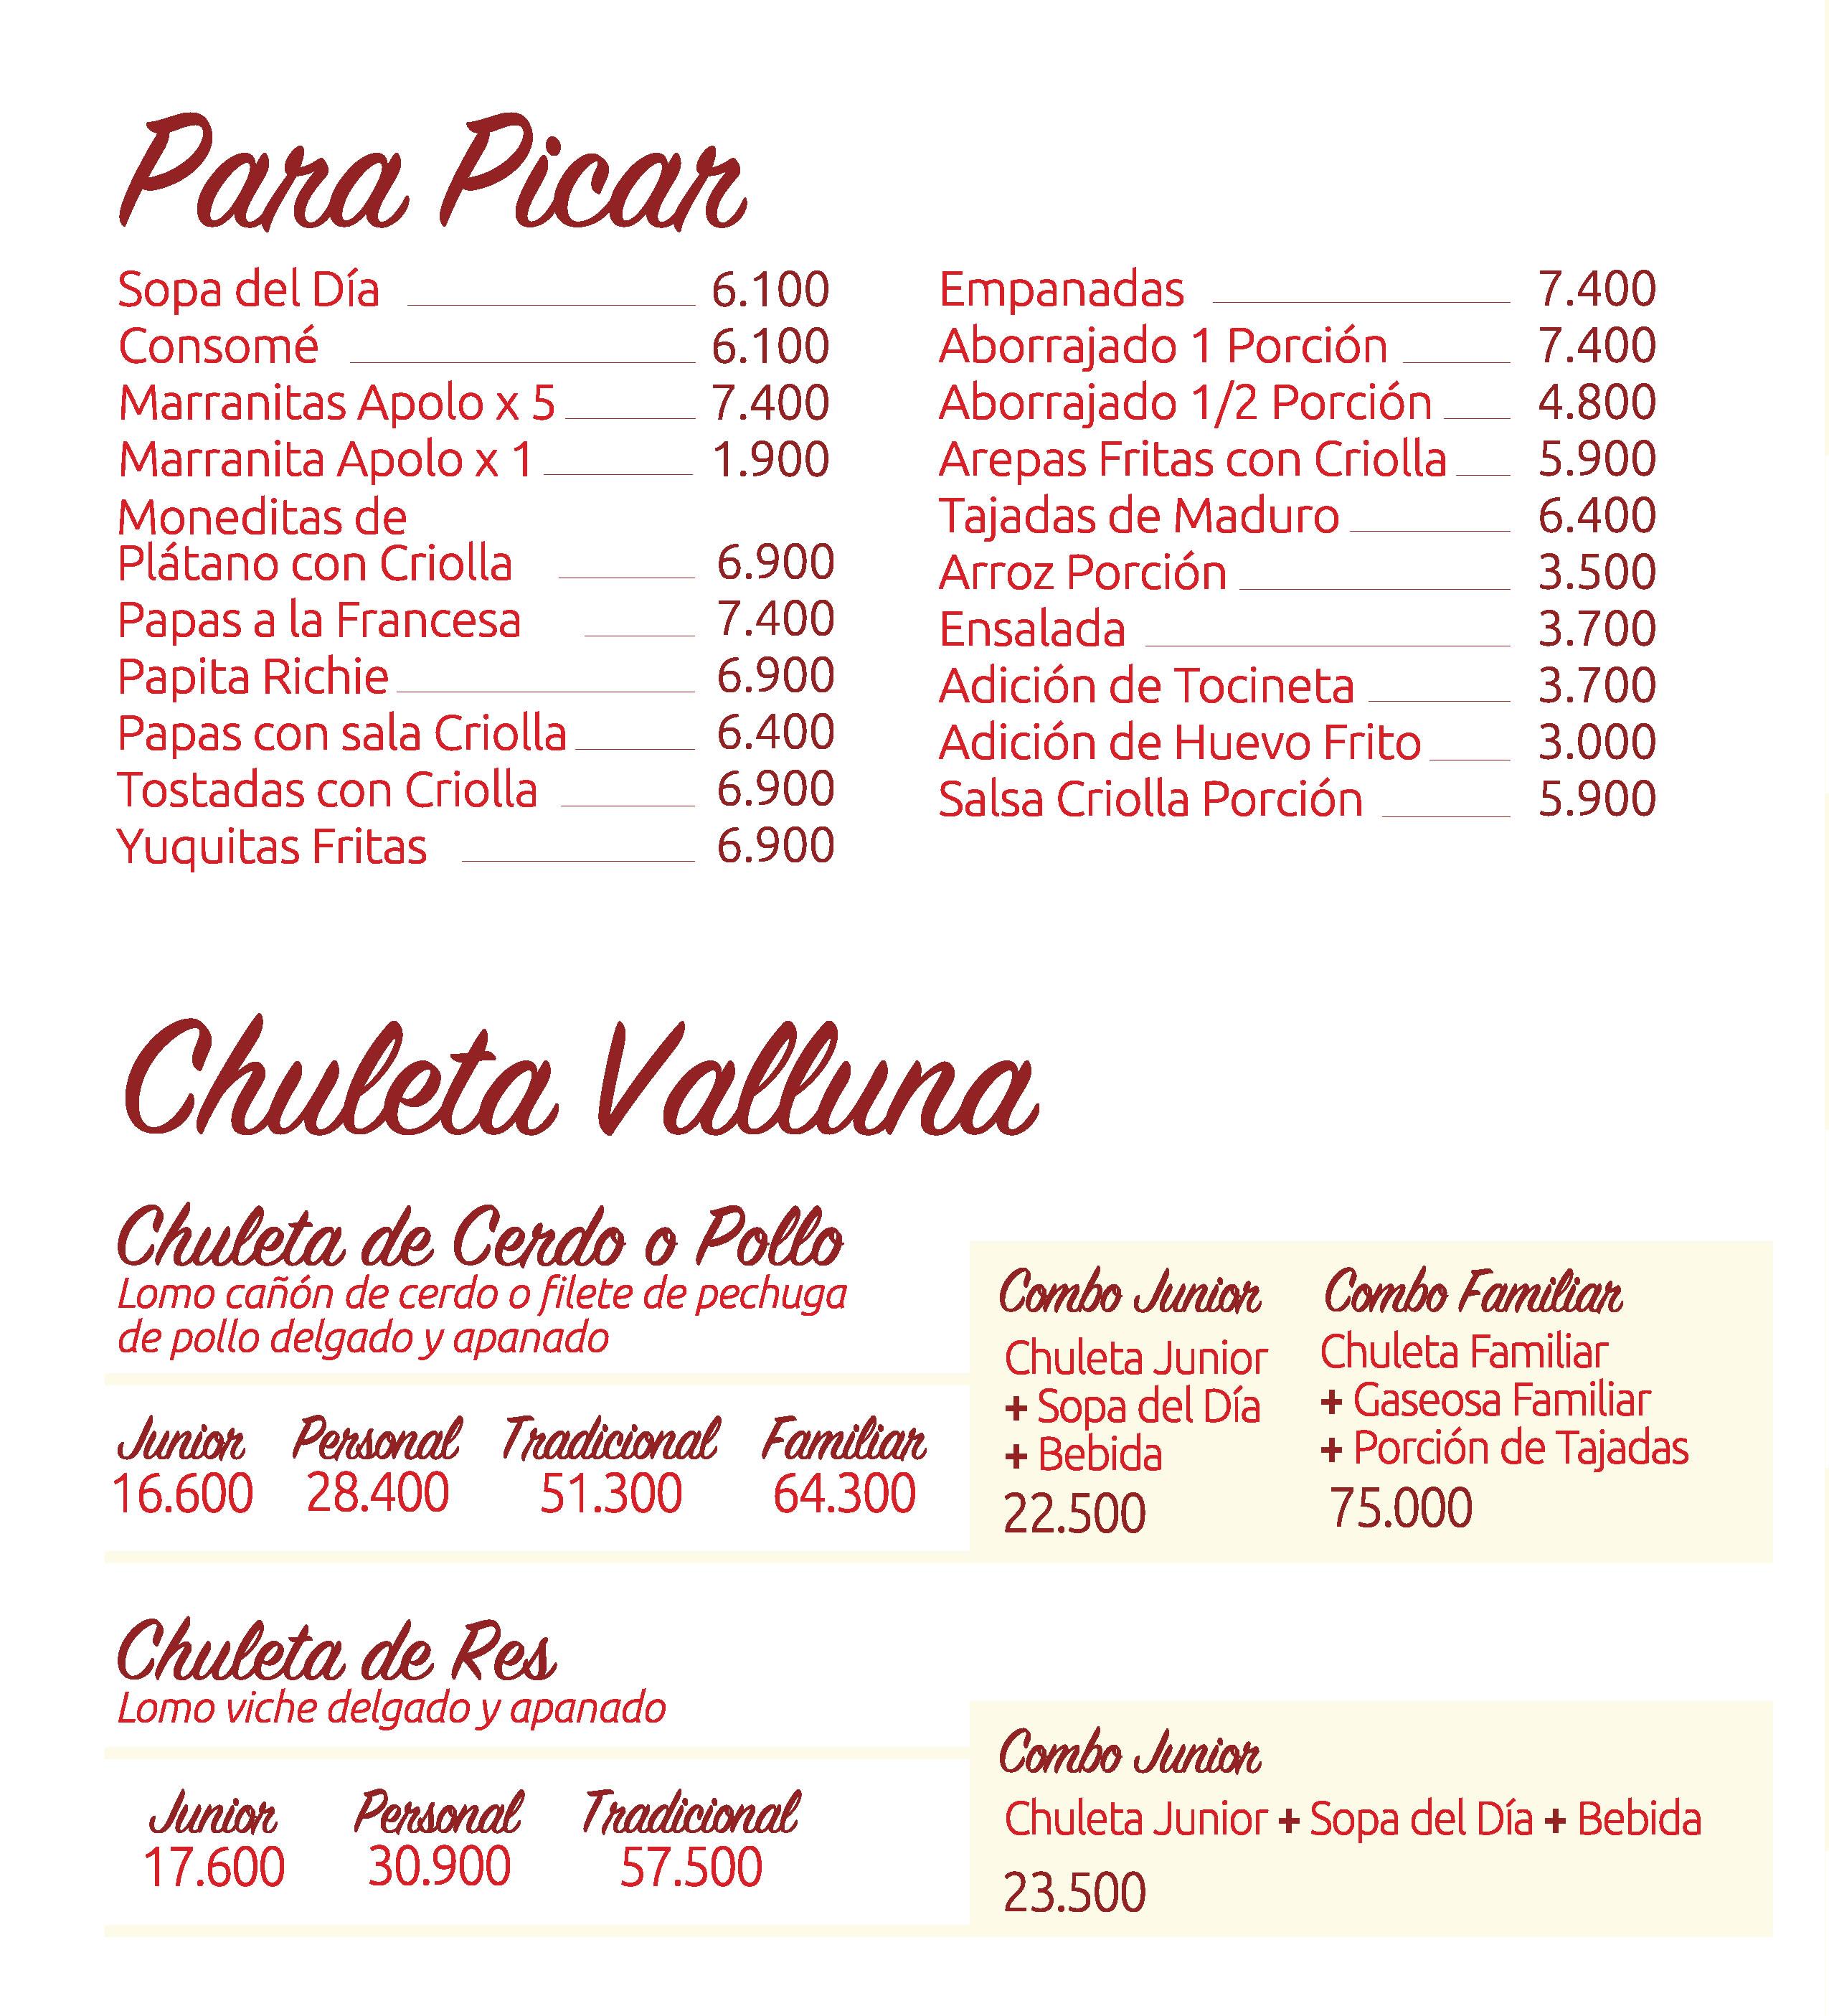 Chuleta Valluna de Apolo Restaurantes